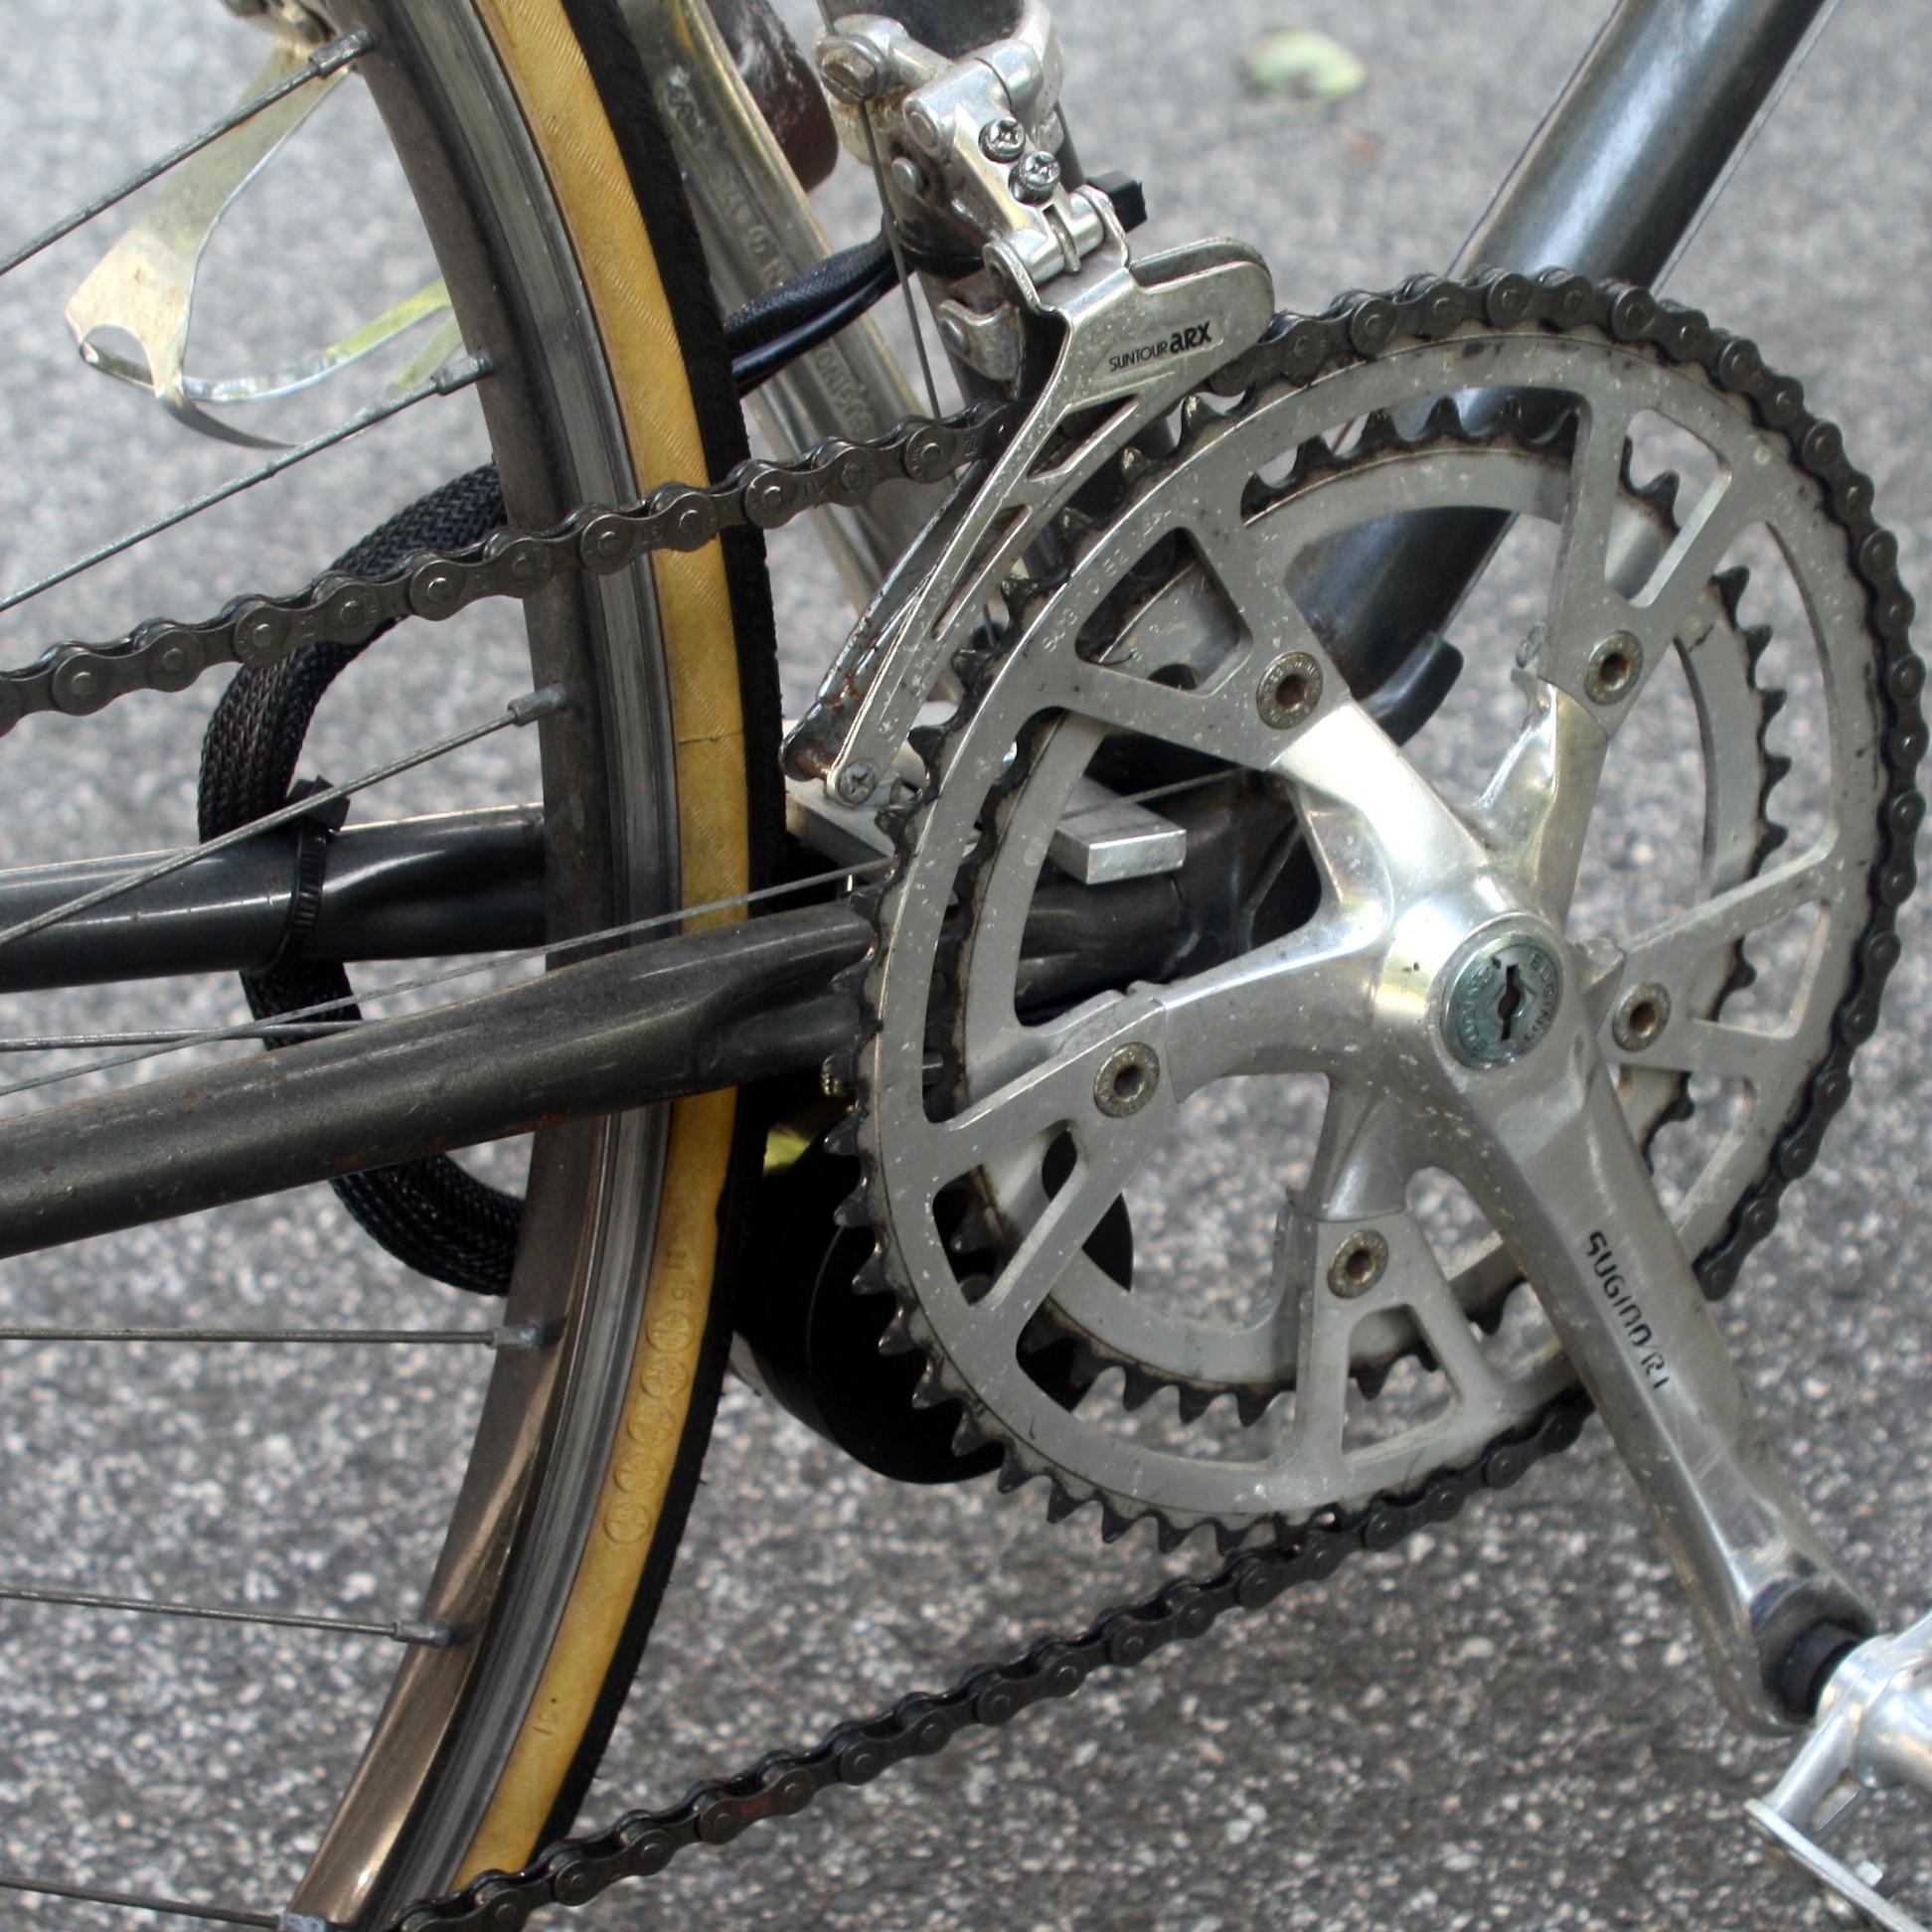 Outrunner motor drives rear wheel via friction